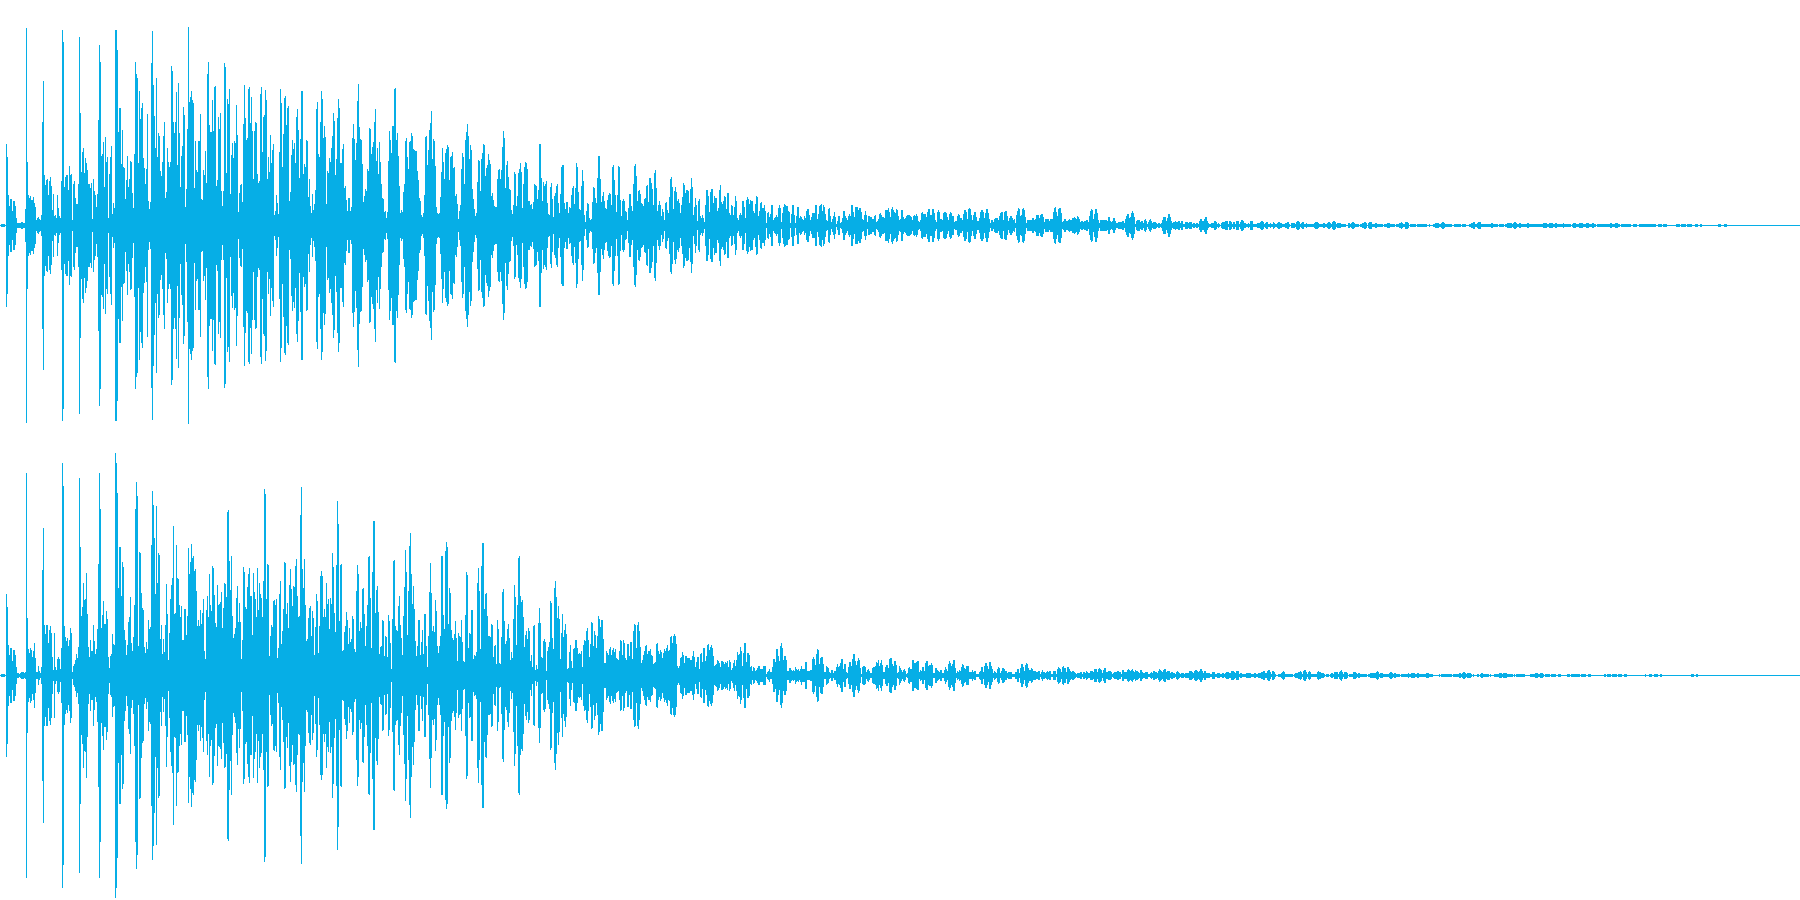 Bass ブリッと重厚な決定音 残響付きの再生済みの波形